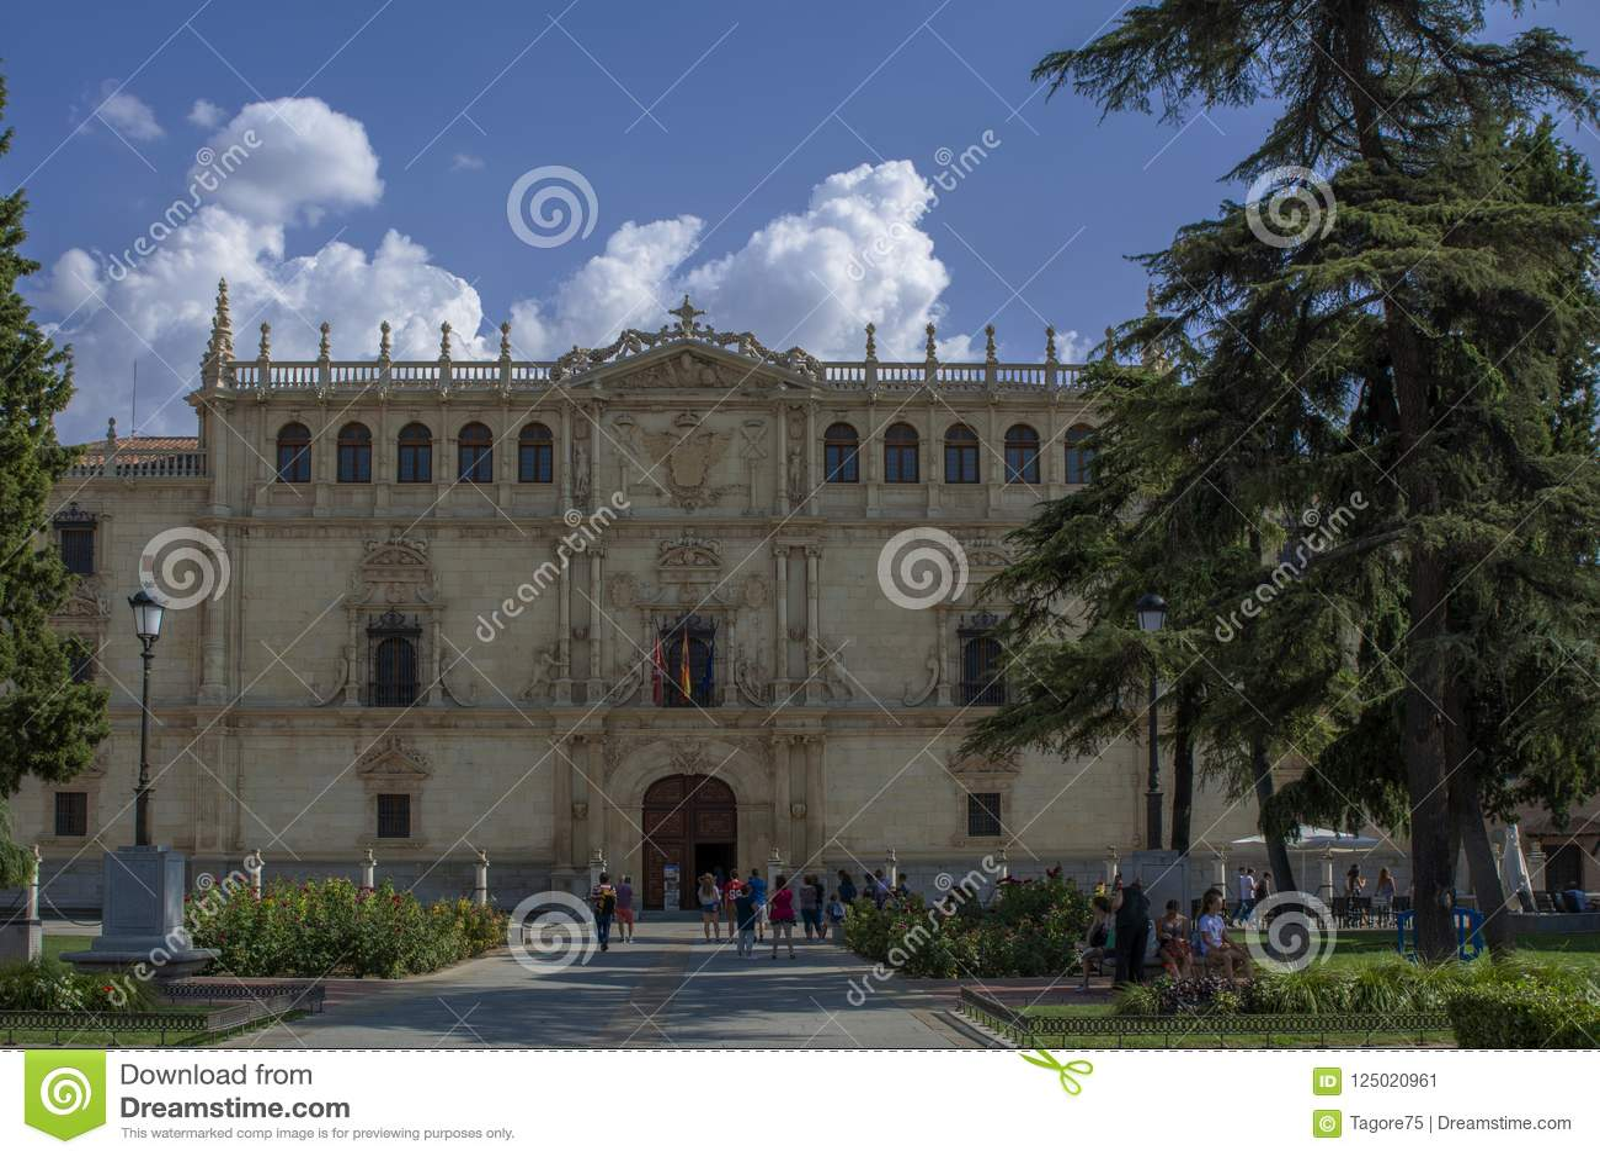 Facade of the Alcala de Henares University, Madrid, Spain